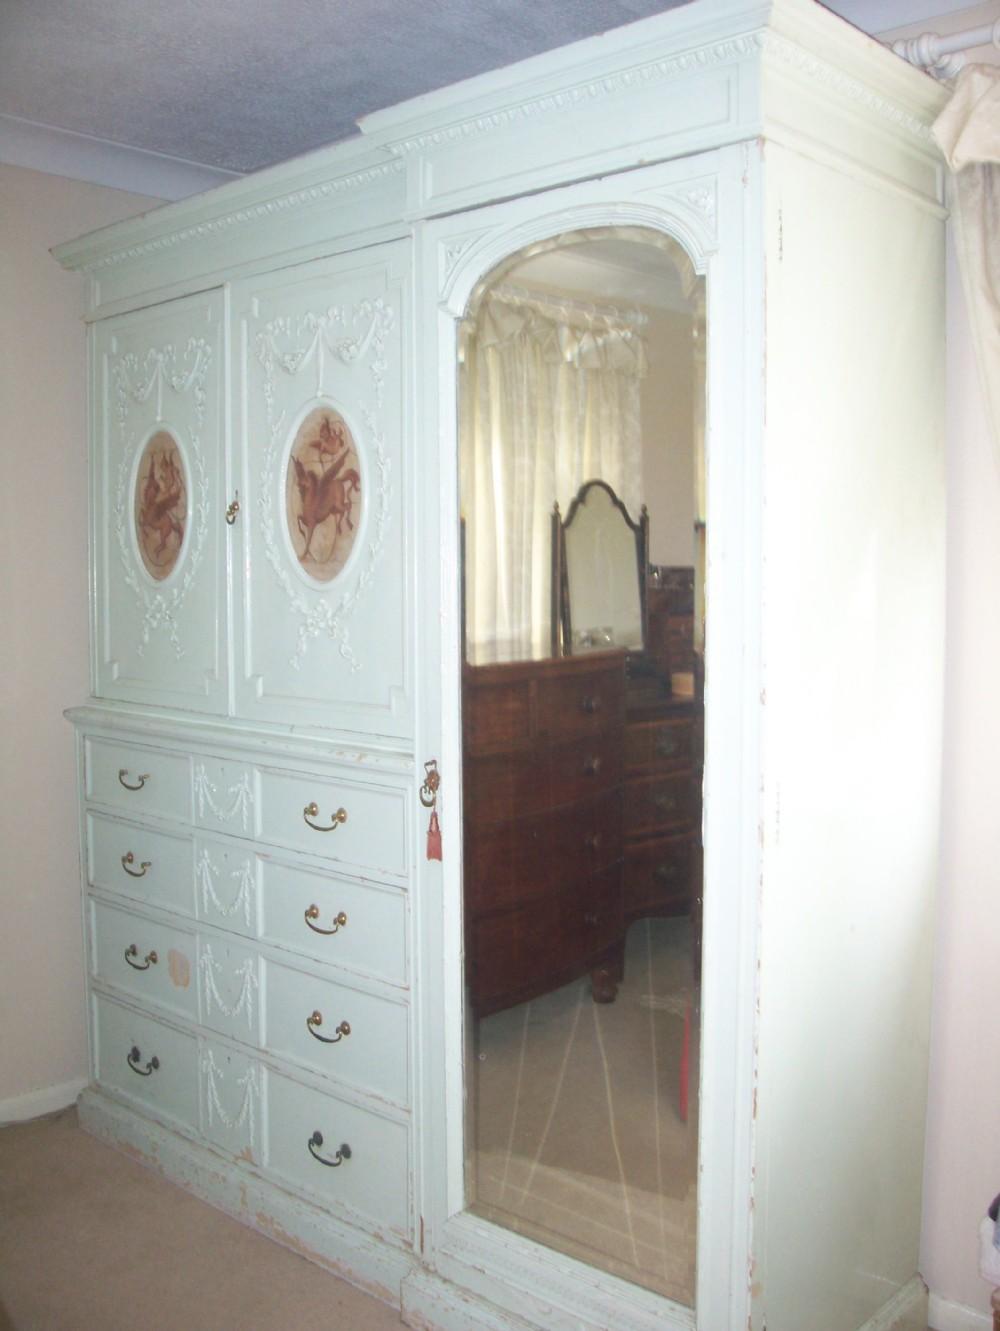 painted linen presscompactum